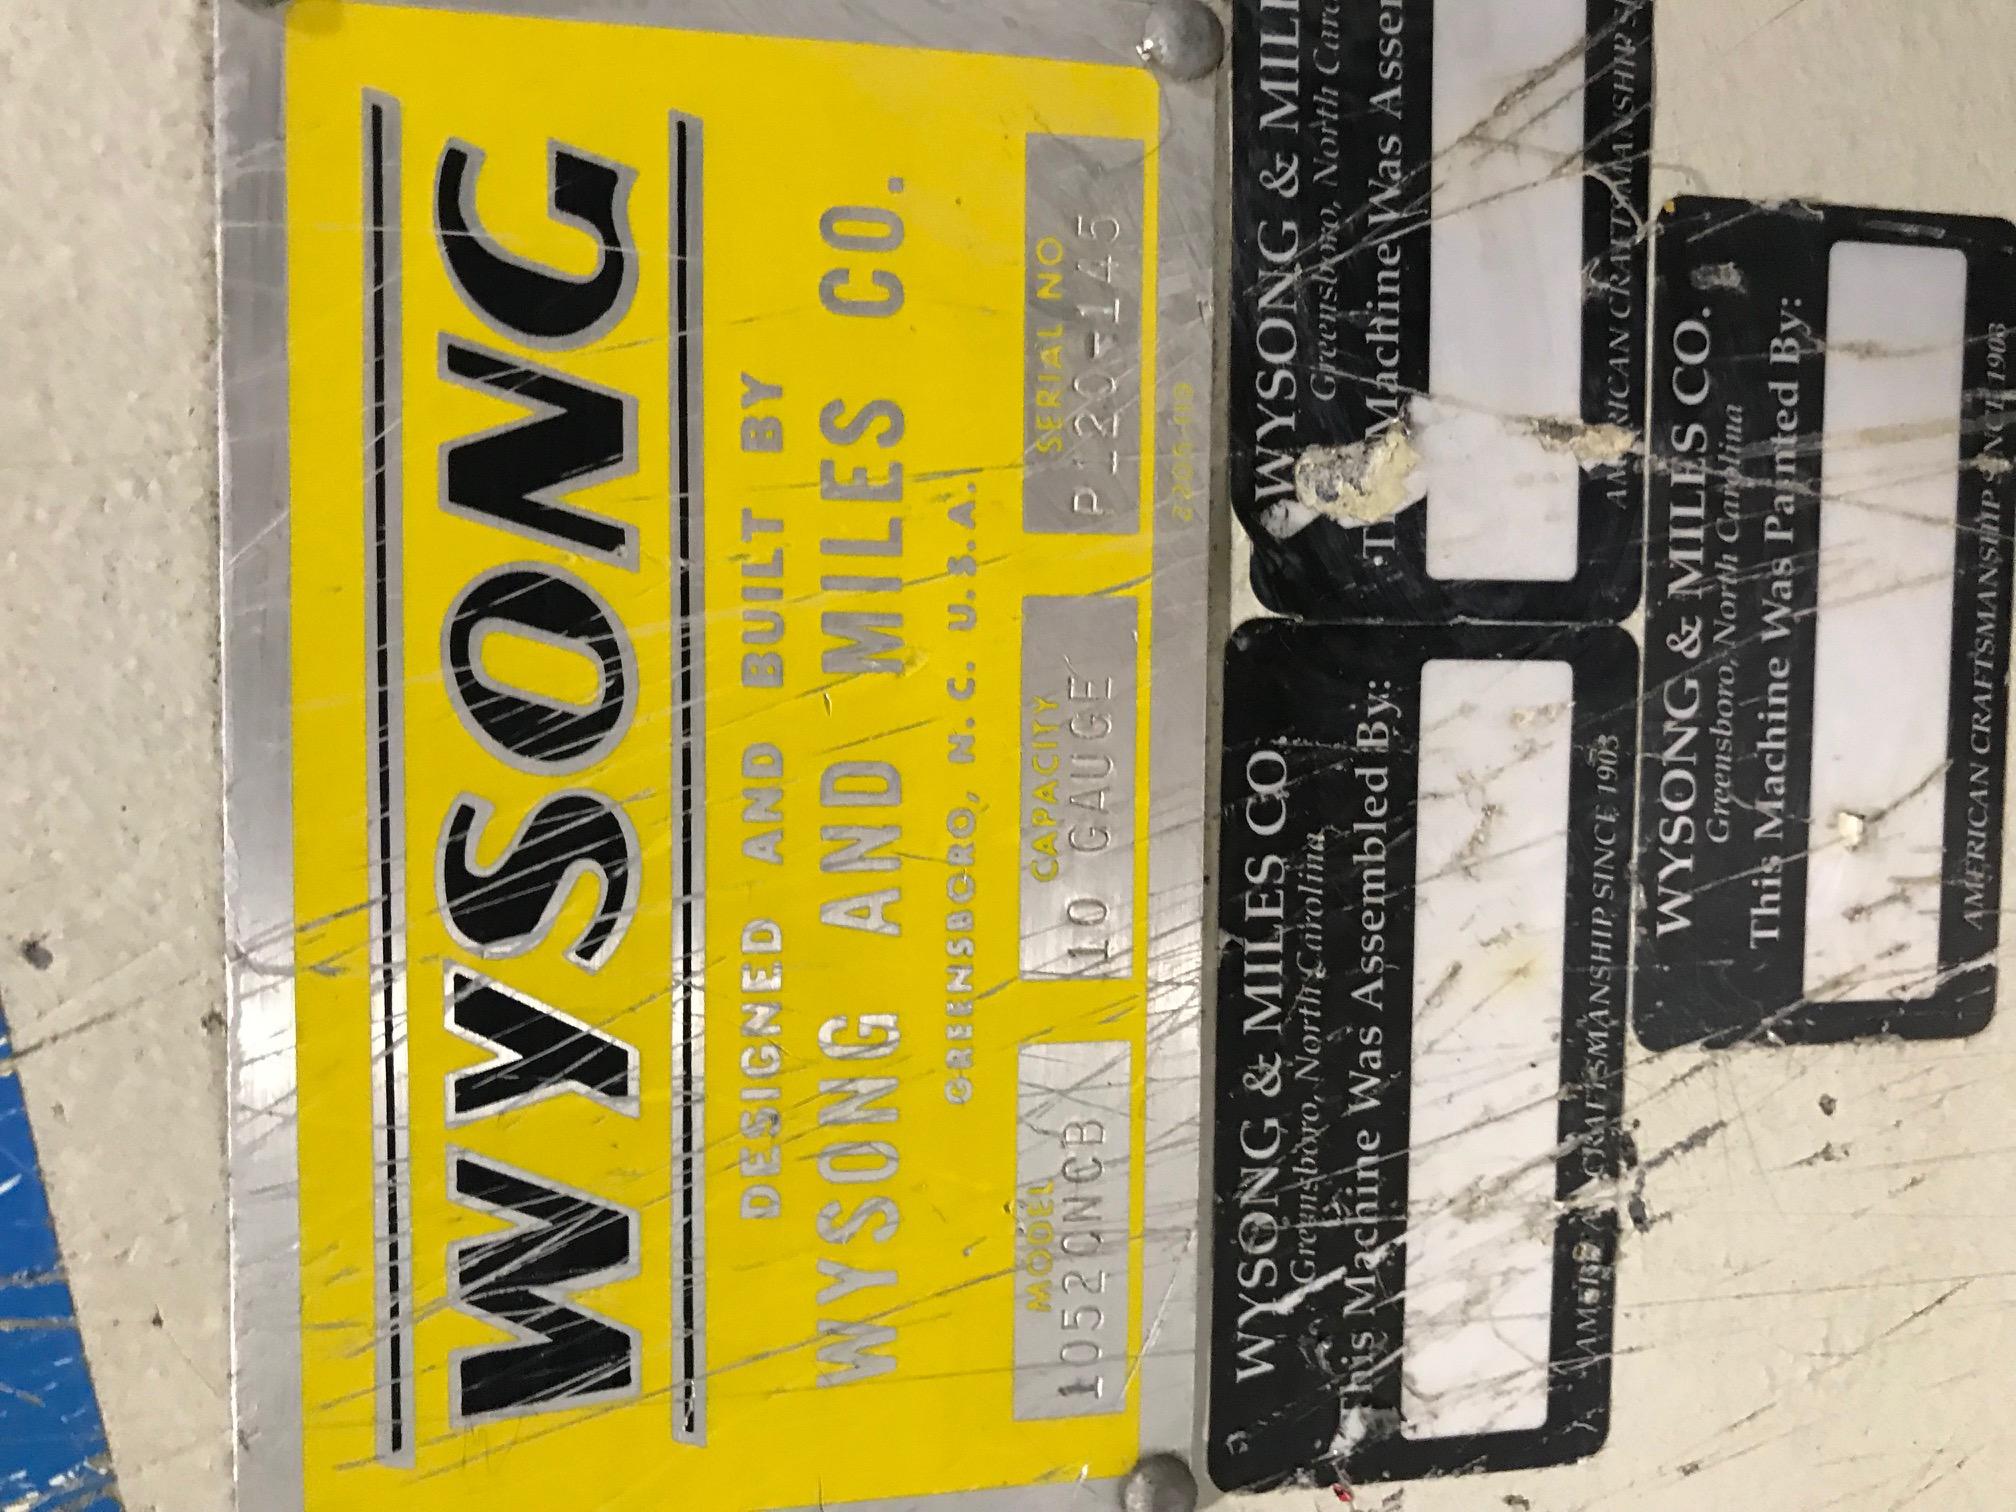 "Lot 9 - WYSONG 52"" X 10GA MECHANICAL SHEAR MOD. 1052CNCB, 60 STROKES/MIN. S/N: P120-145, PC100 BACKGAGE ("